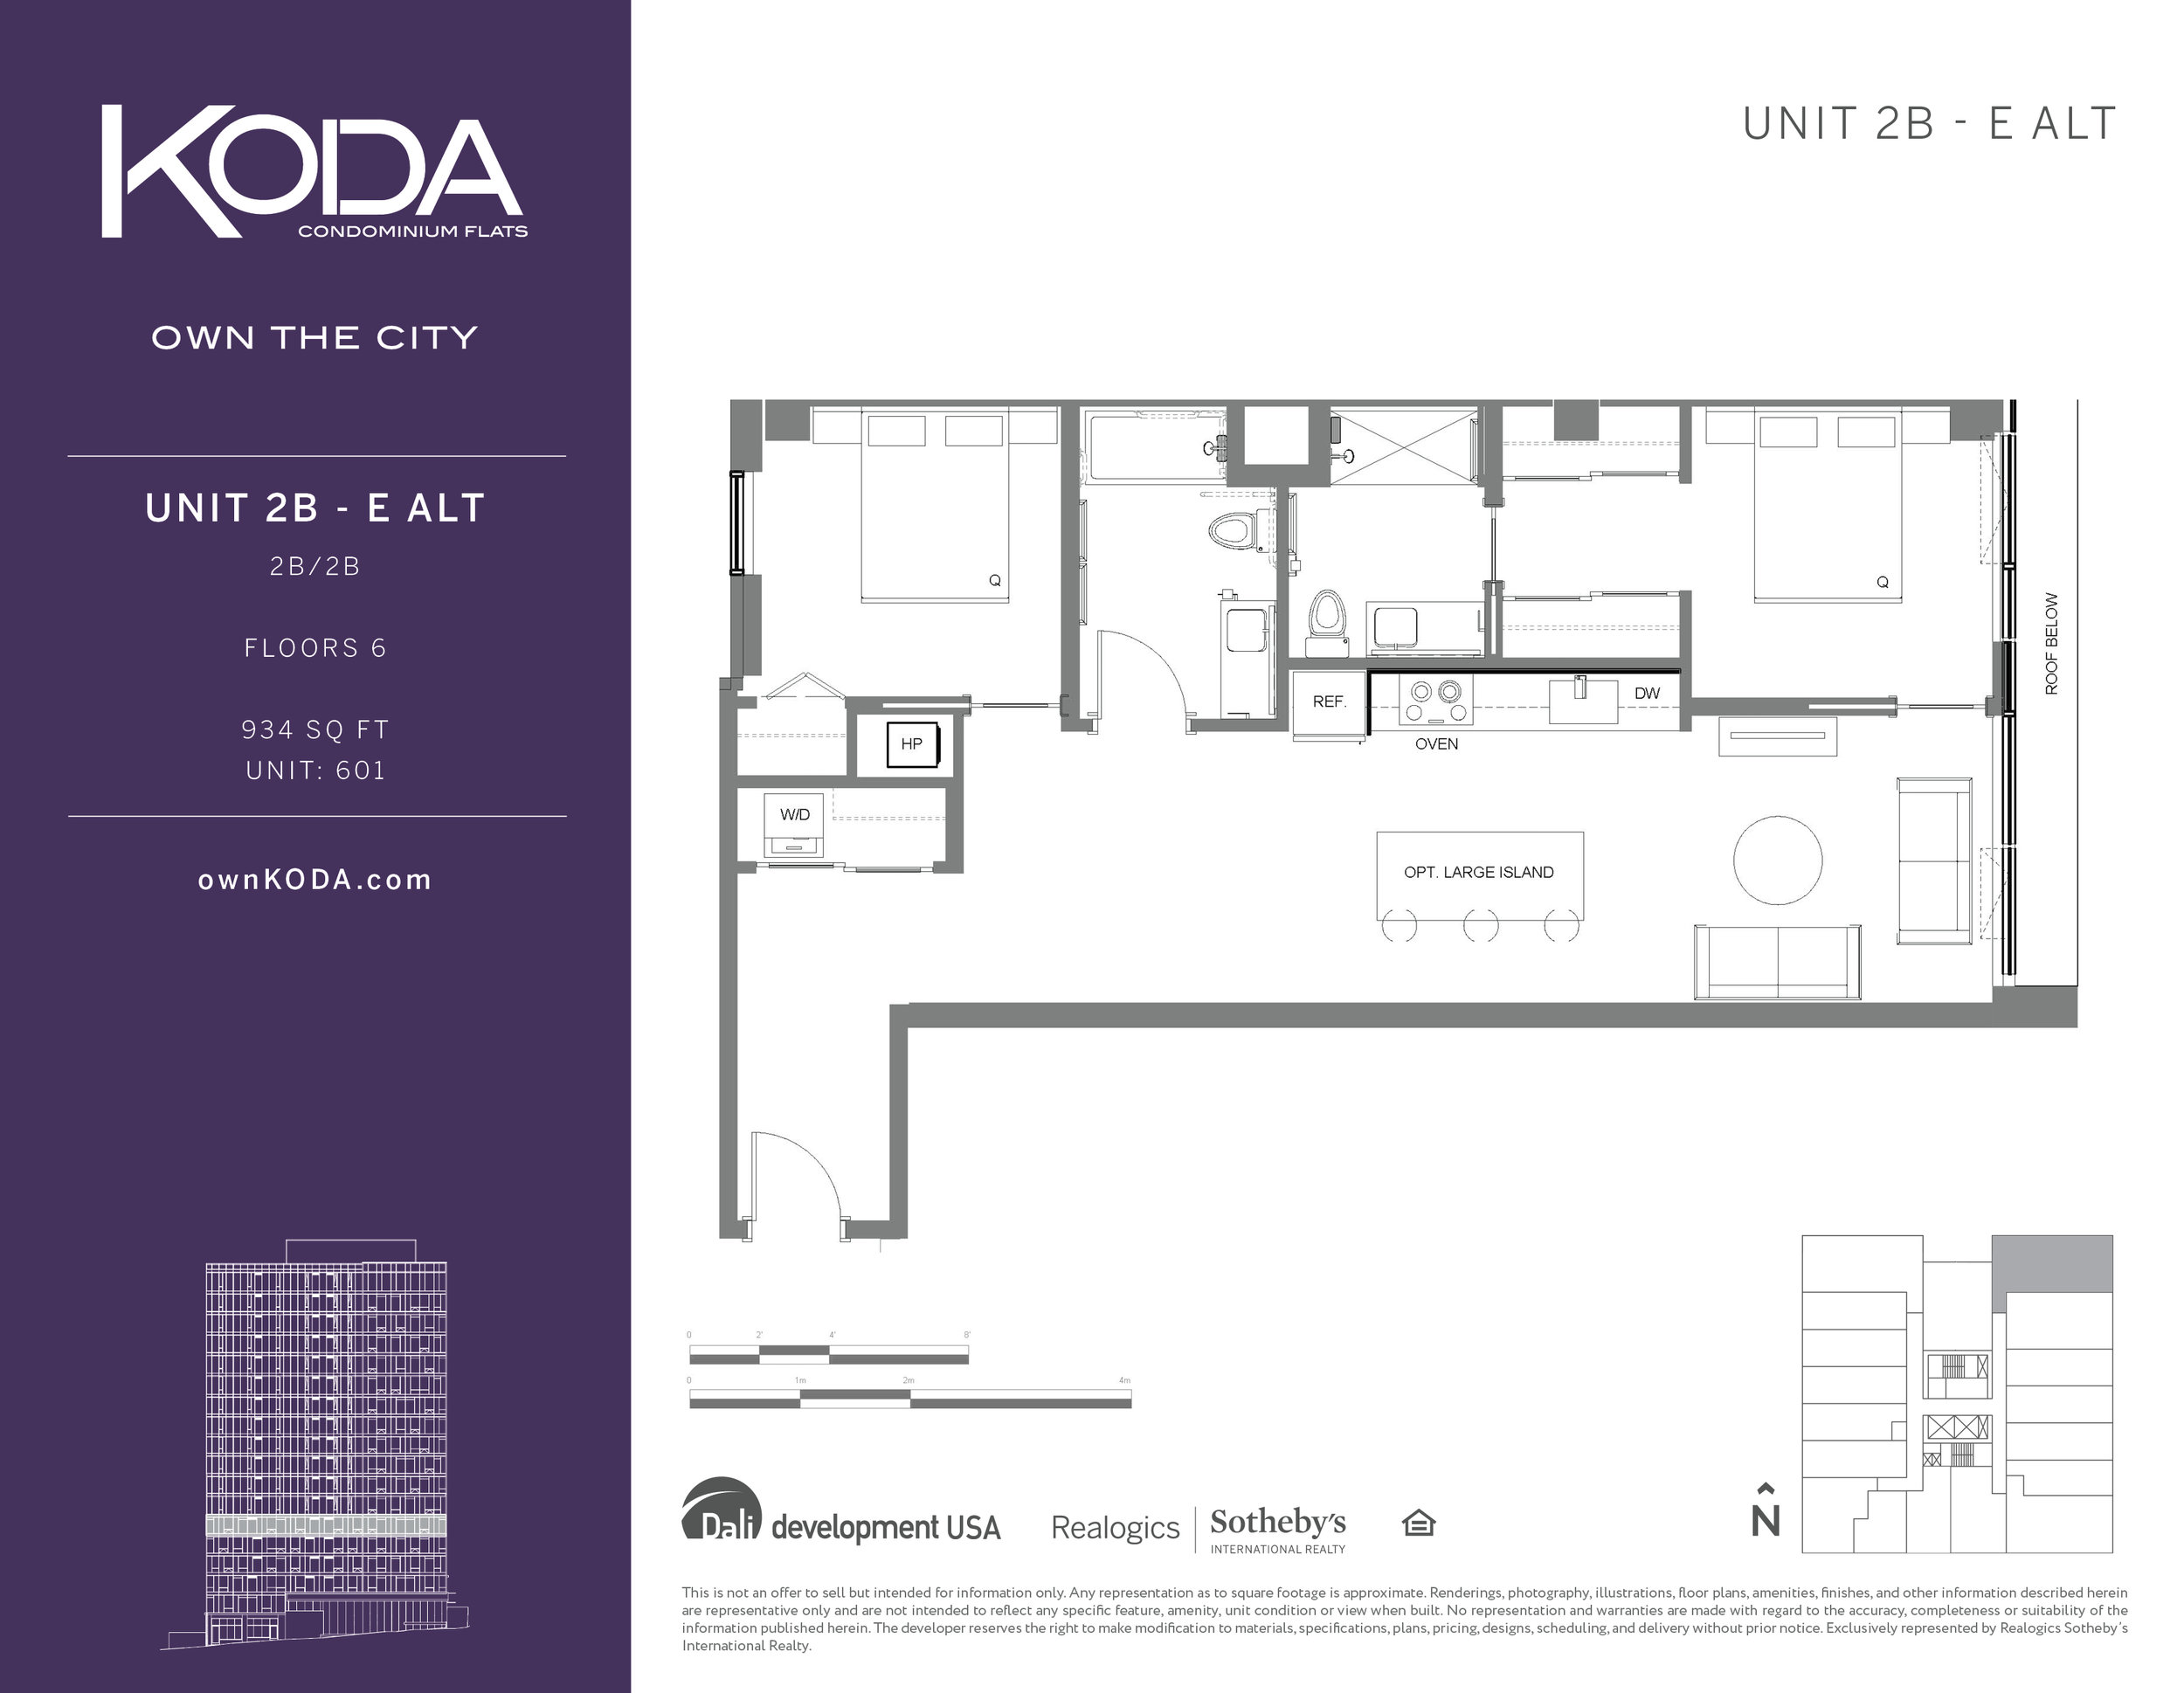 KODA_FloorPlanFlyer_Update_Approved_04.04.19_Release31.jpg